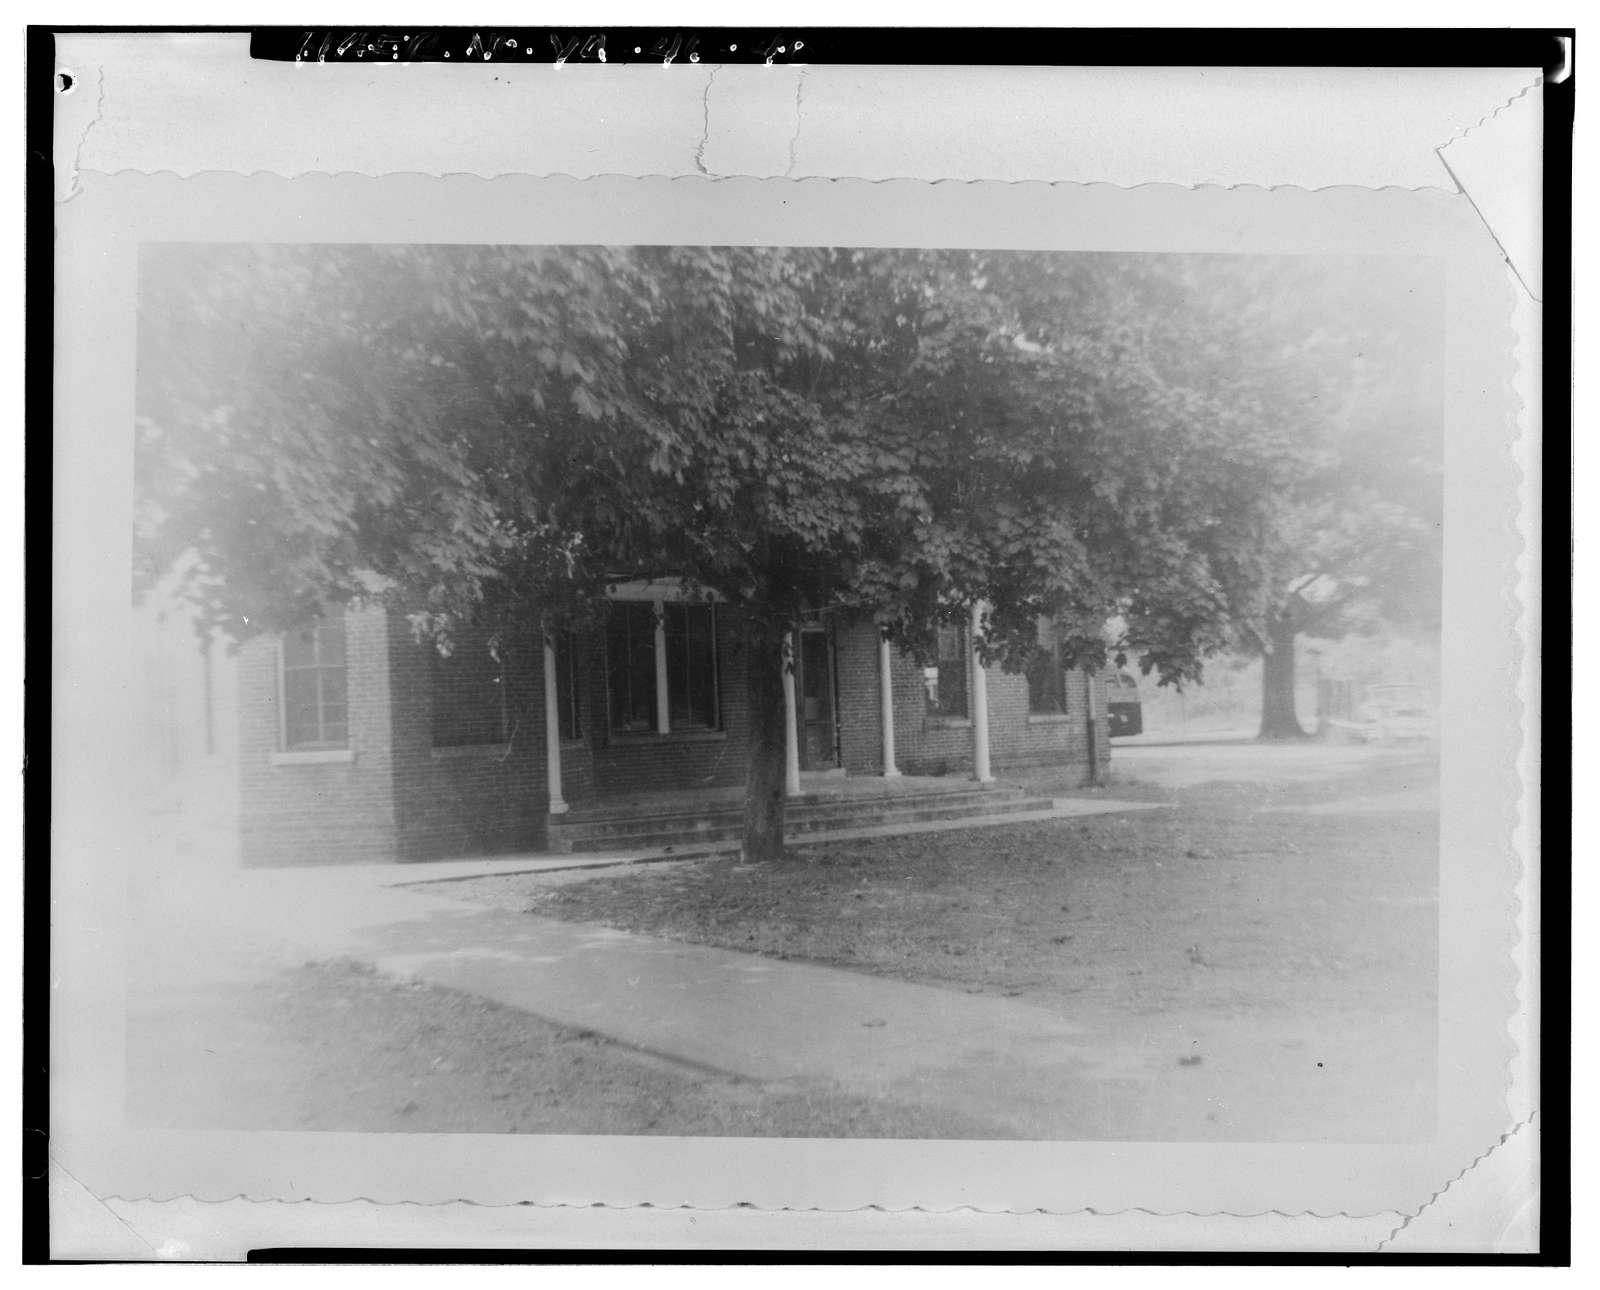 Newport News & Old Point Railway & Electric Company, Trolley Barn & Administration Building, 3400 Victoria Boulevard, Hampton, Hampton, VA